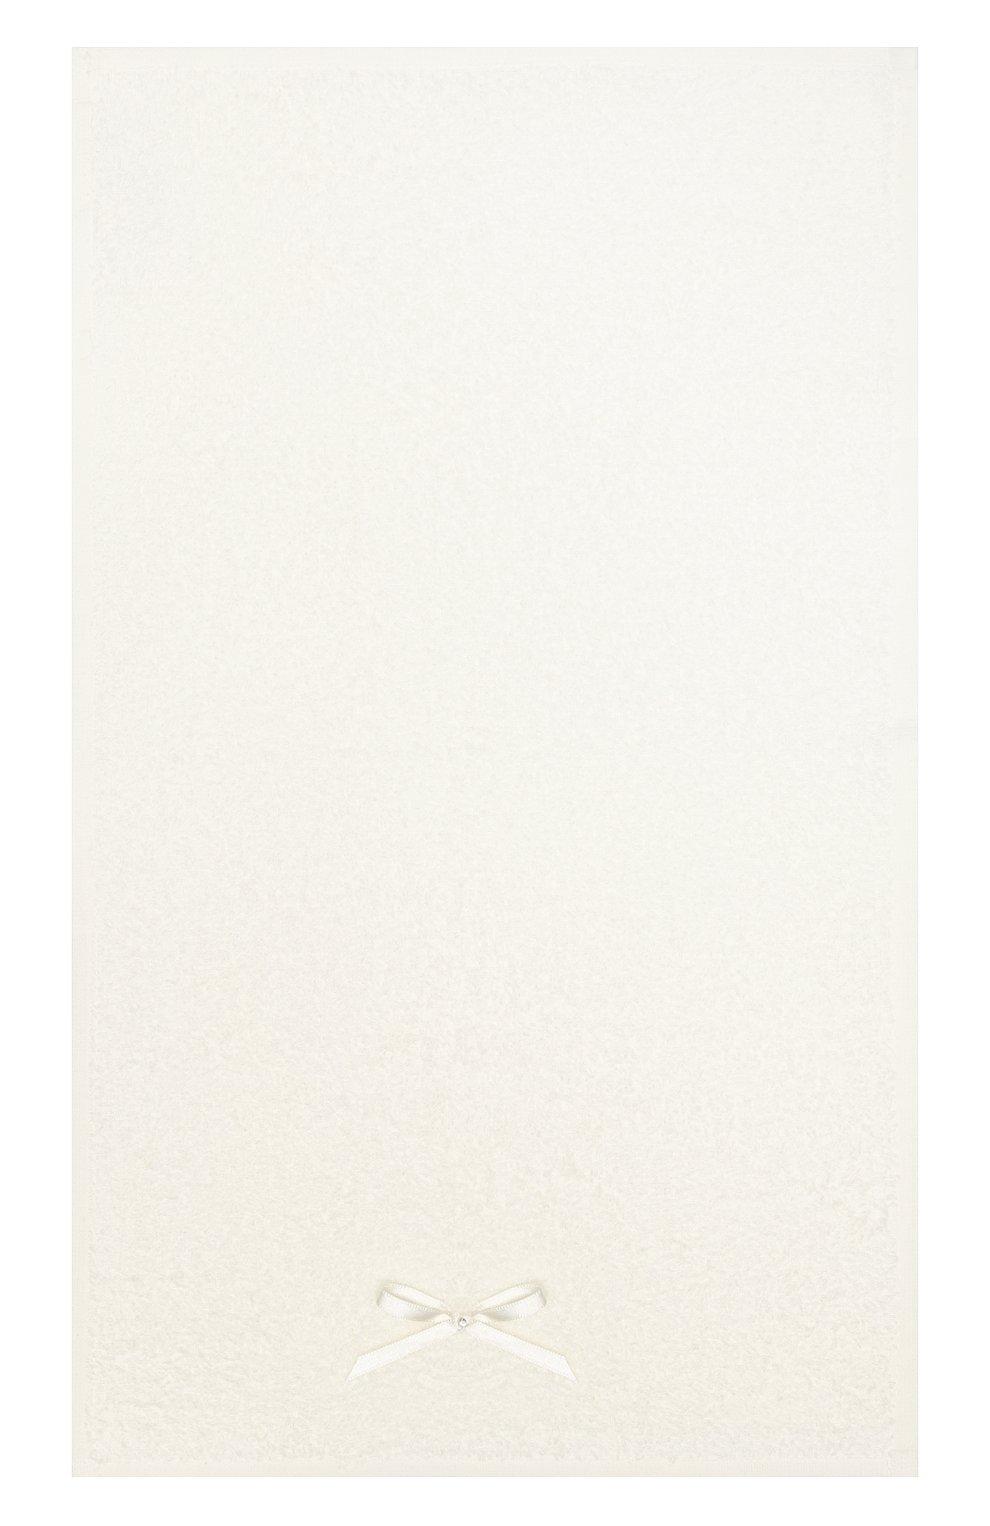 Детского комплект из 6-ти предметов ANGEL WINGS бежевого цвета, арт. EXC578   Фото 10